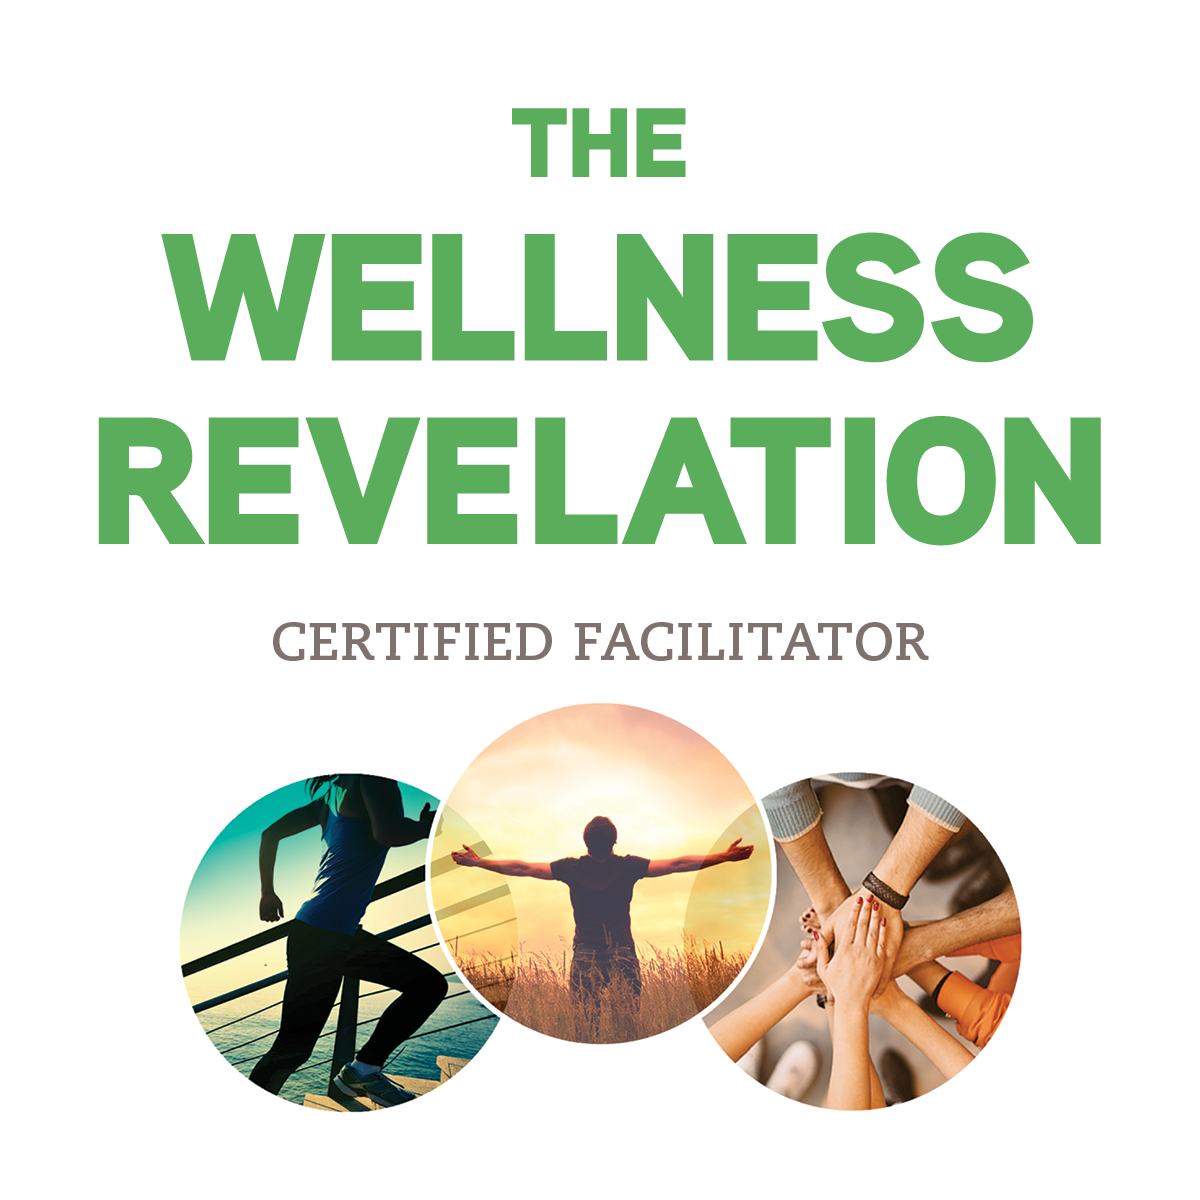 The Wellness Revelation Certified Facilitator.png